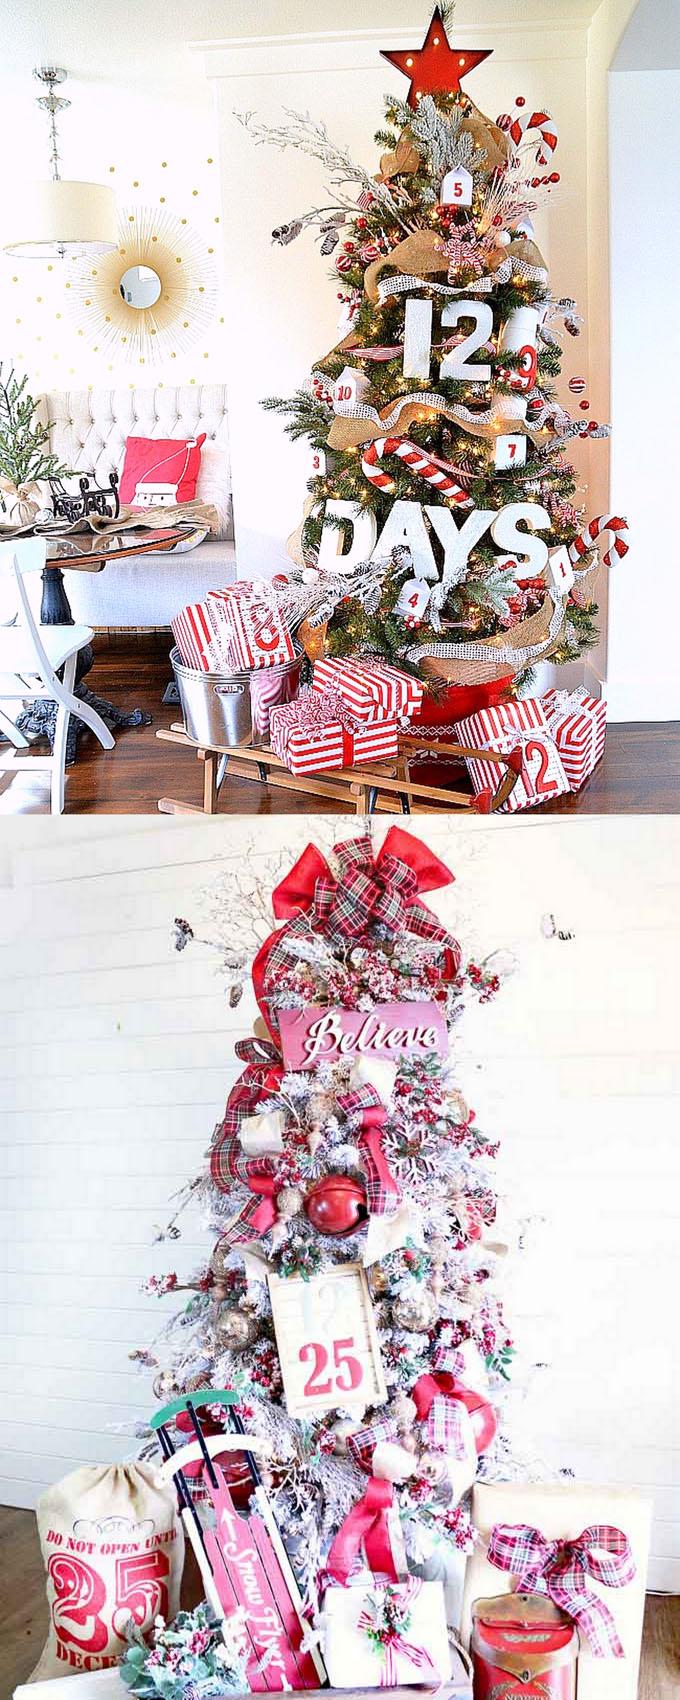 christmas tree decorating ideas elegant decorations how to decorate white red ribbon tutorials apieceofrainbow 10 - 42 Gorgeous Christmas Tree Decorating Ideas { & Best Tutorials!}